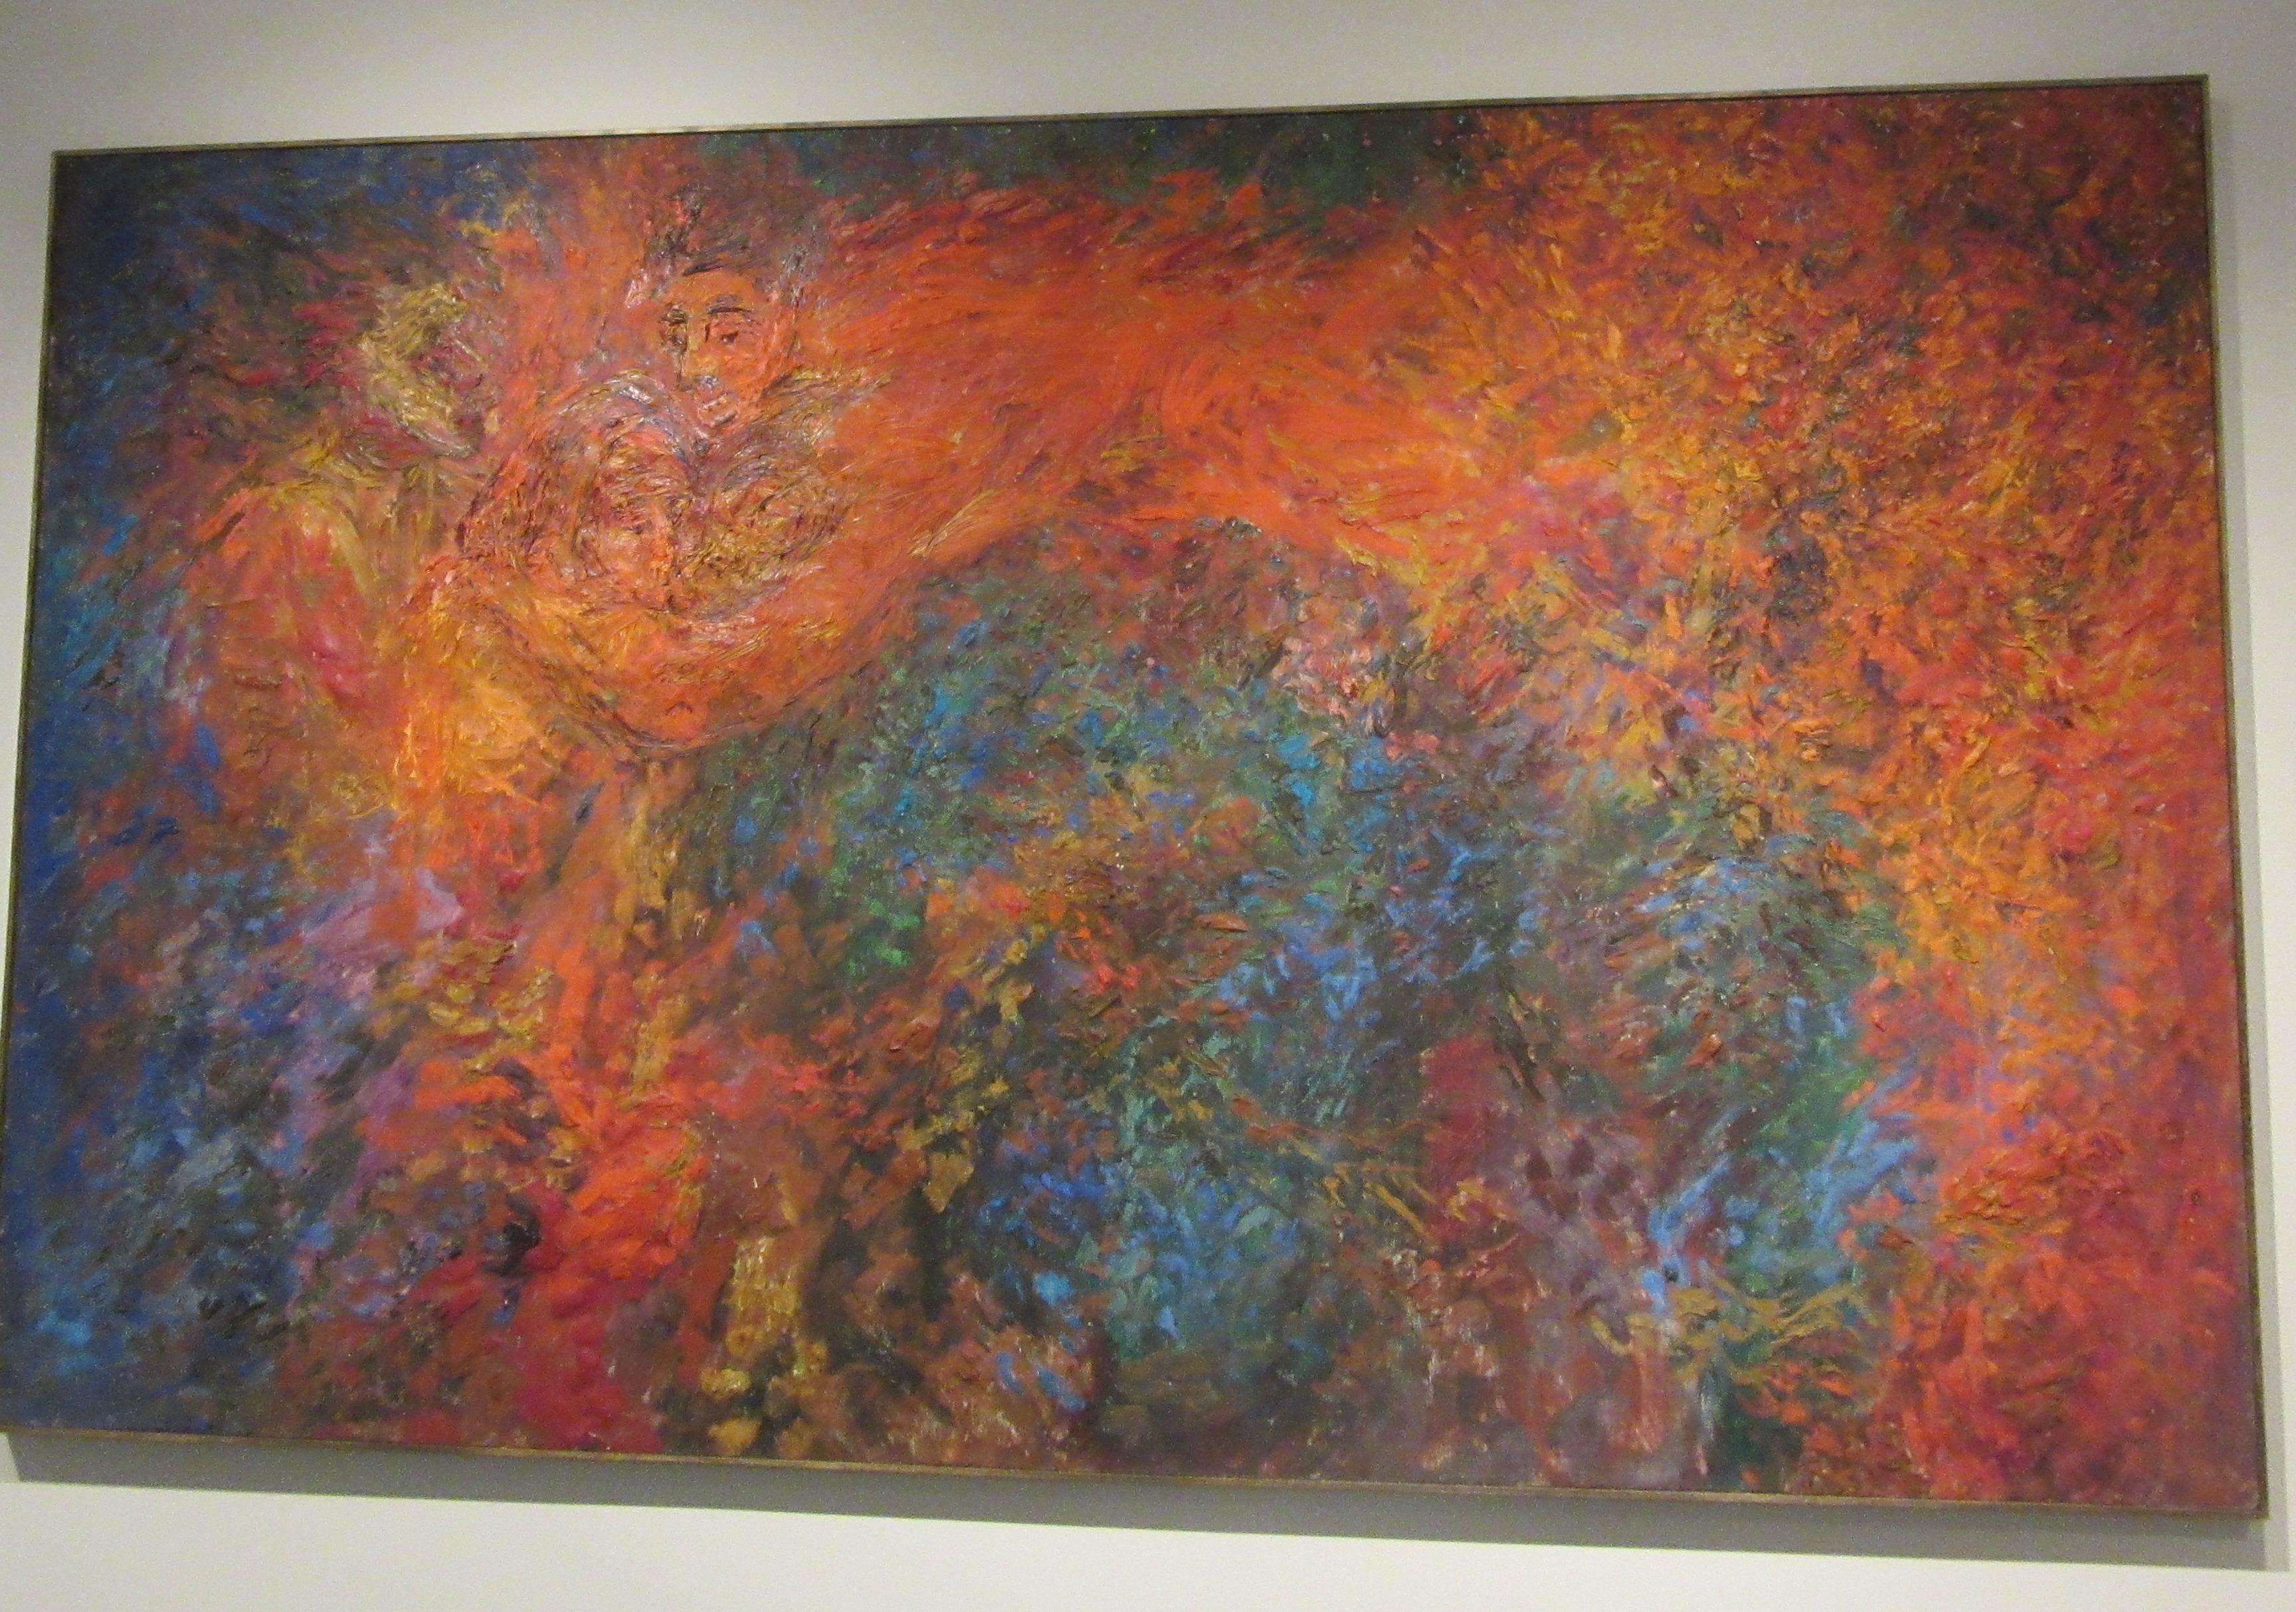 Rosenblatt painting